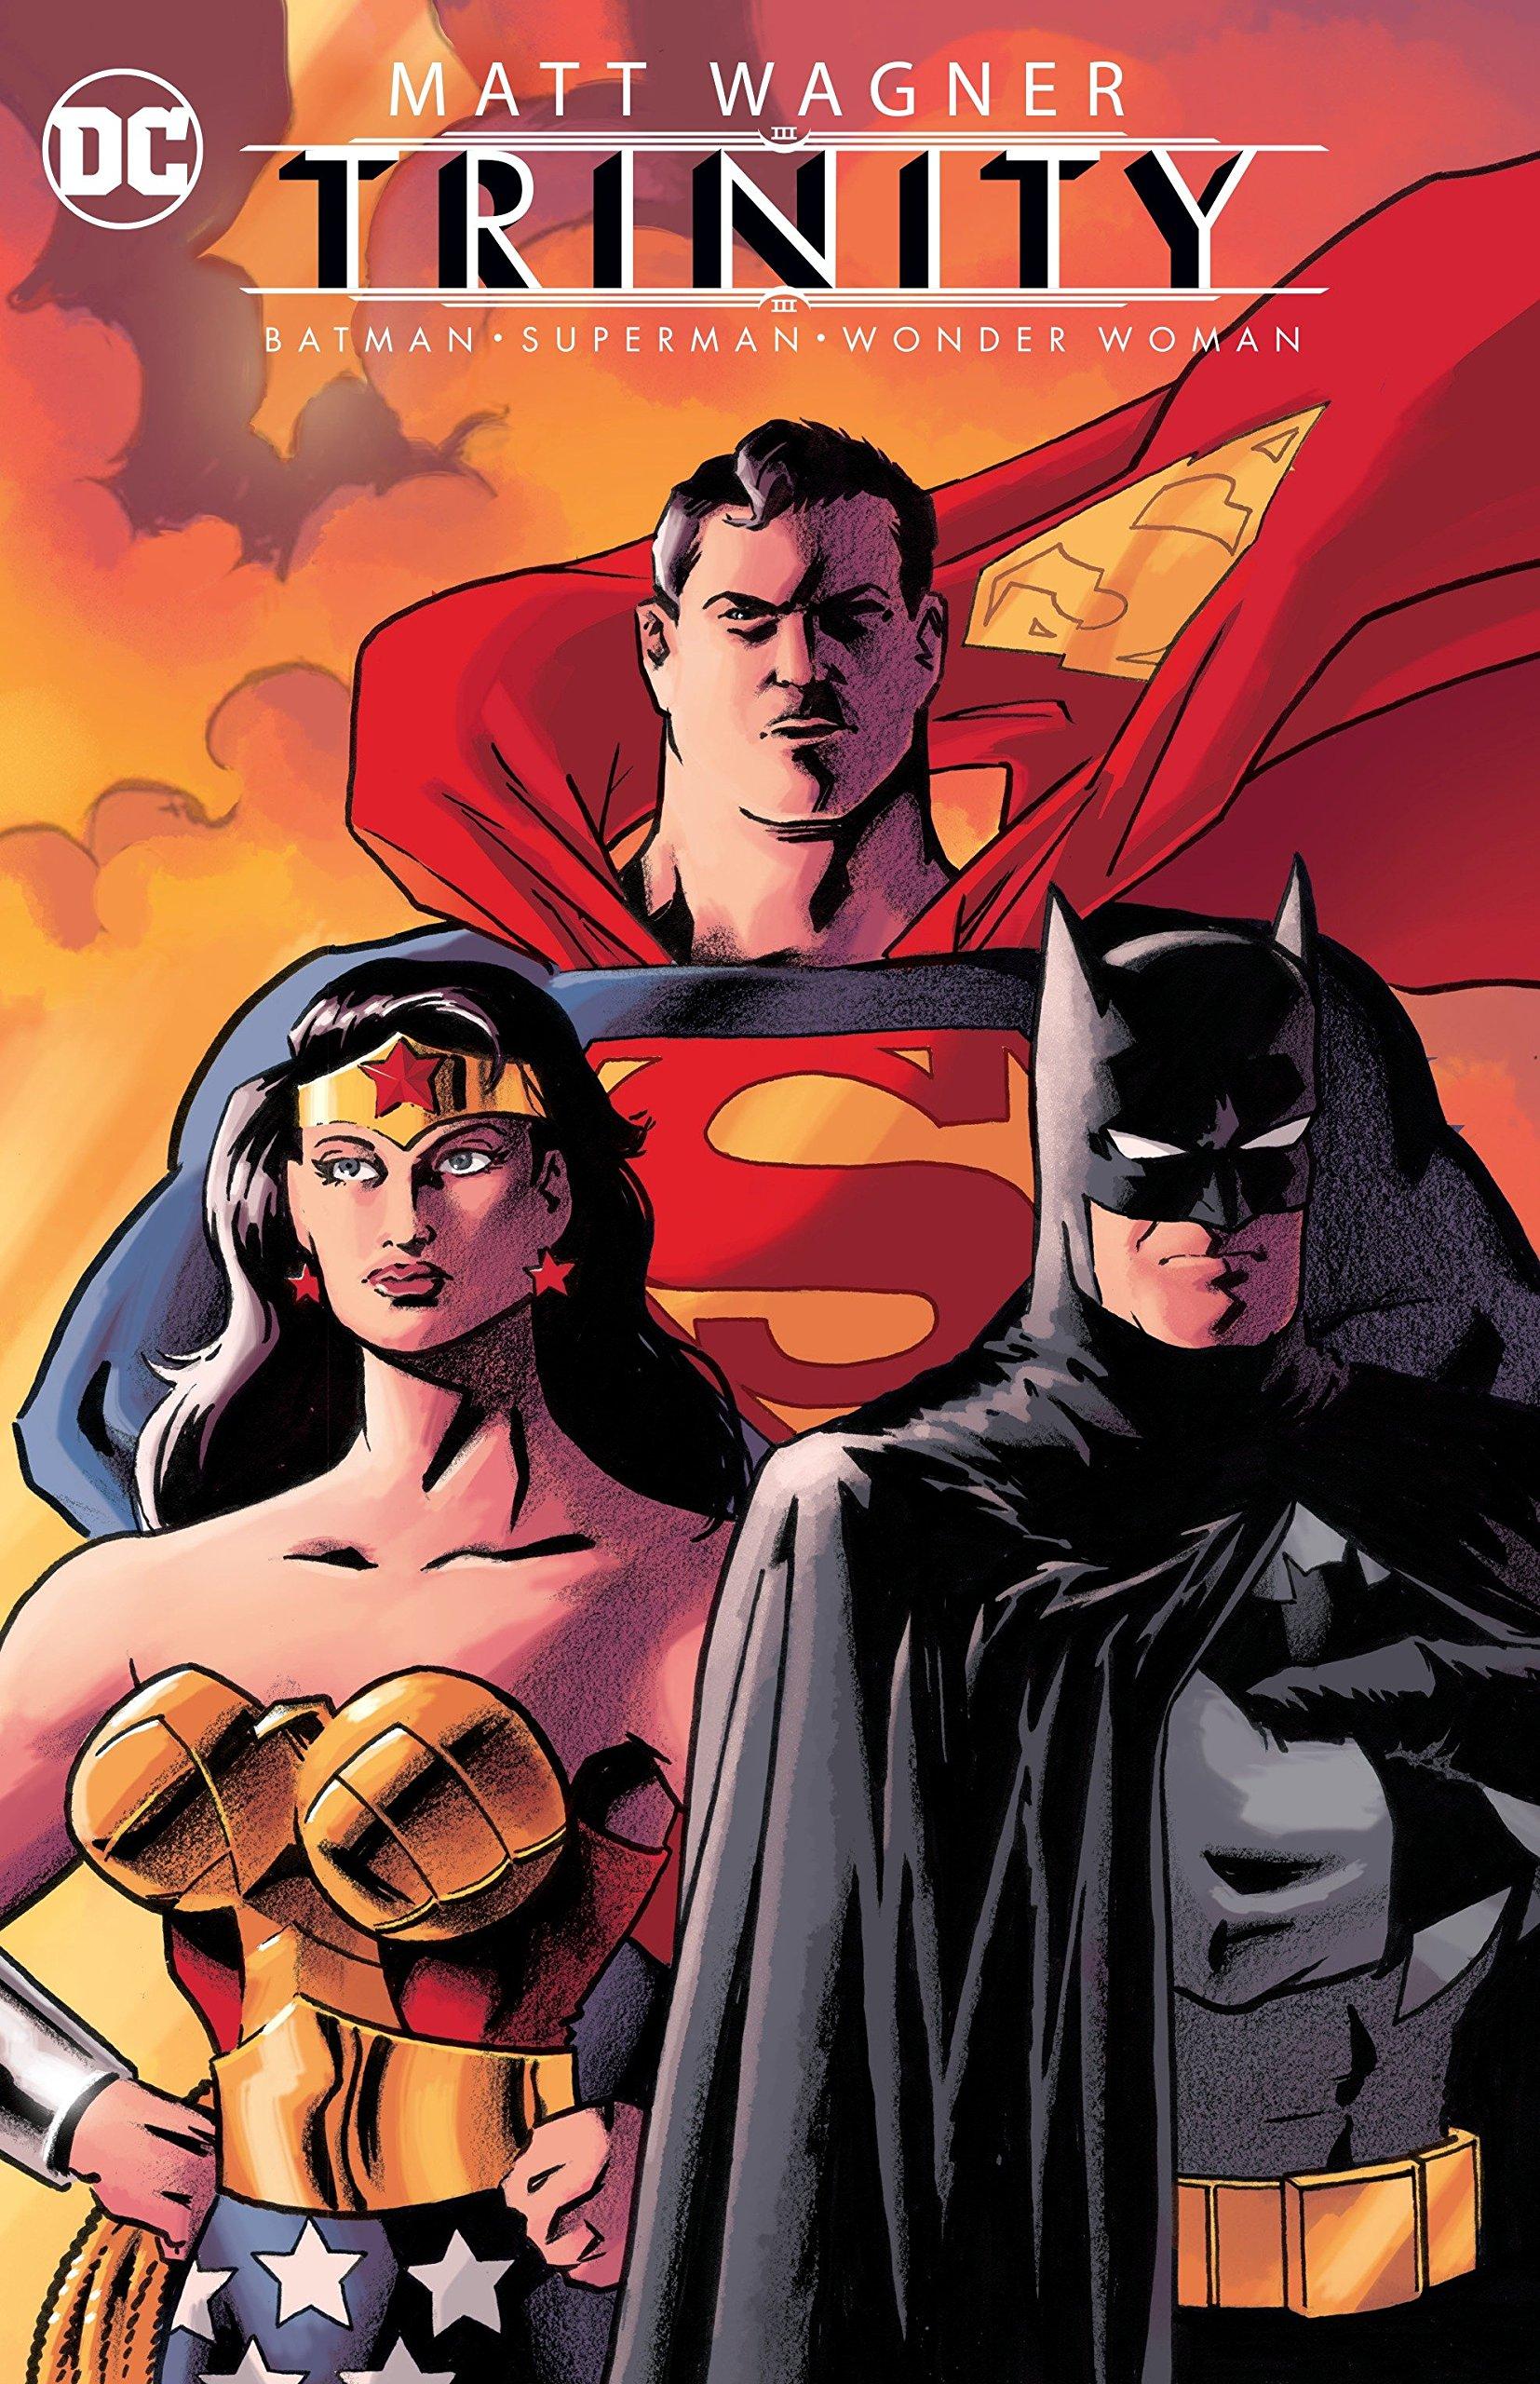 Read Online Batman/Superman/Wonder Woman Trinity ebook